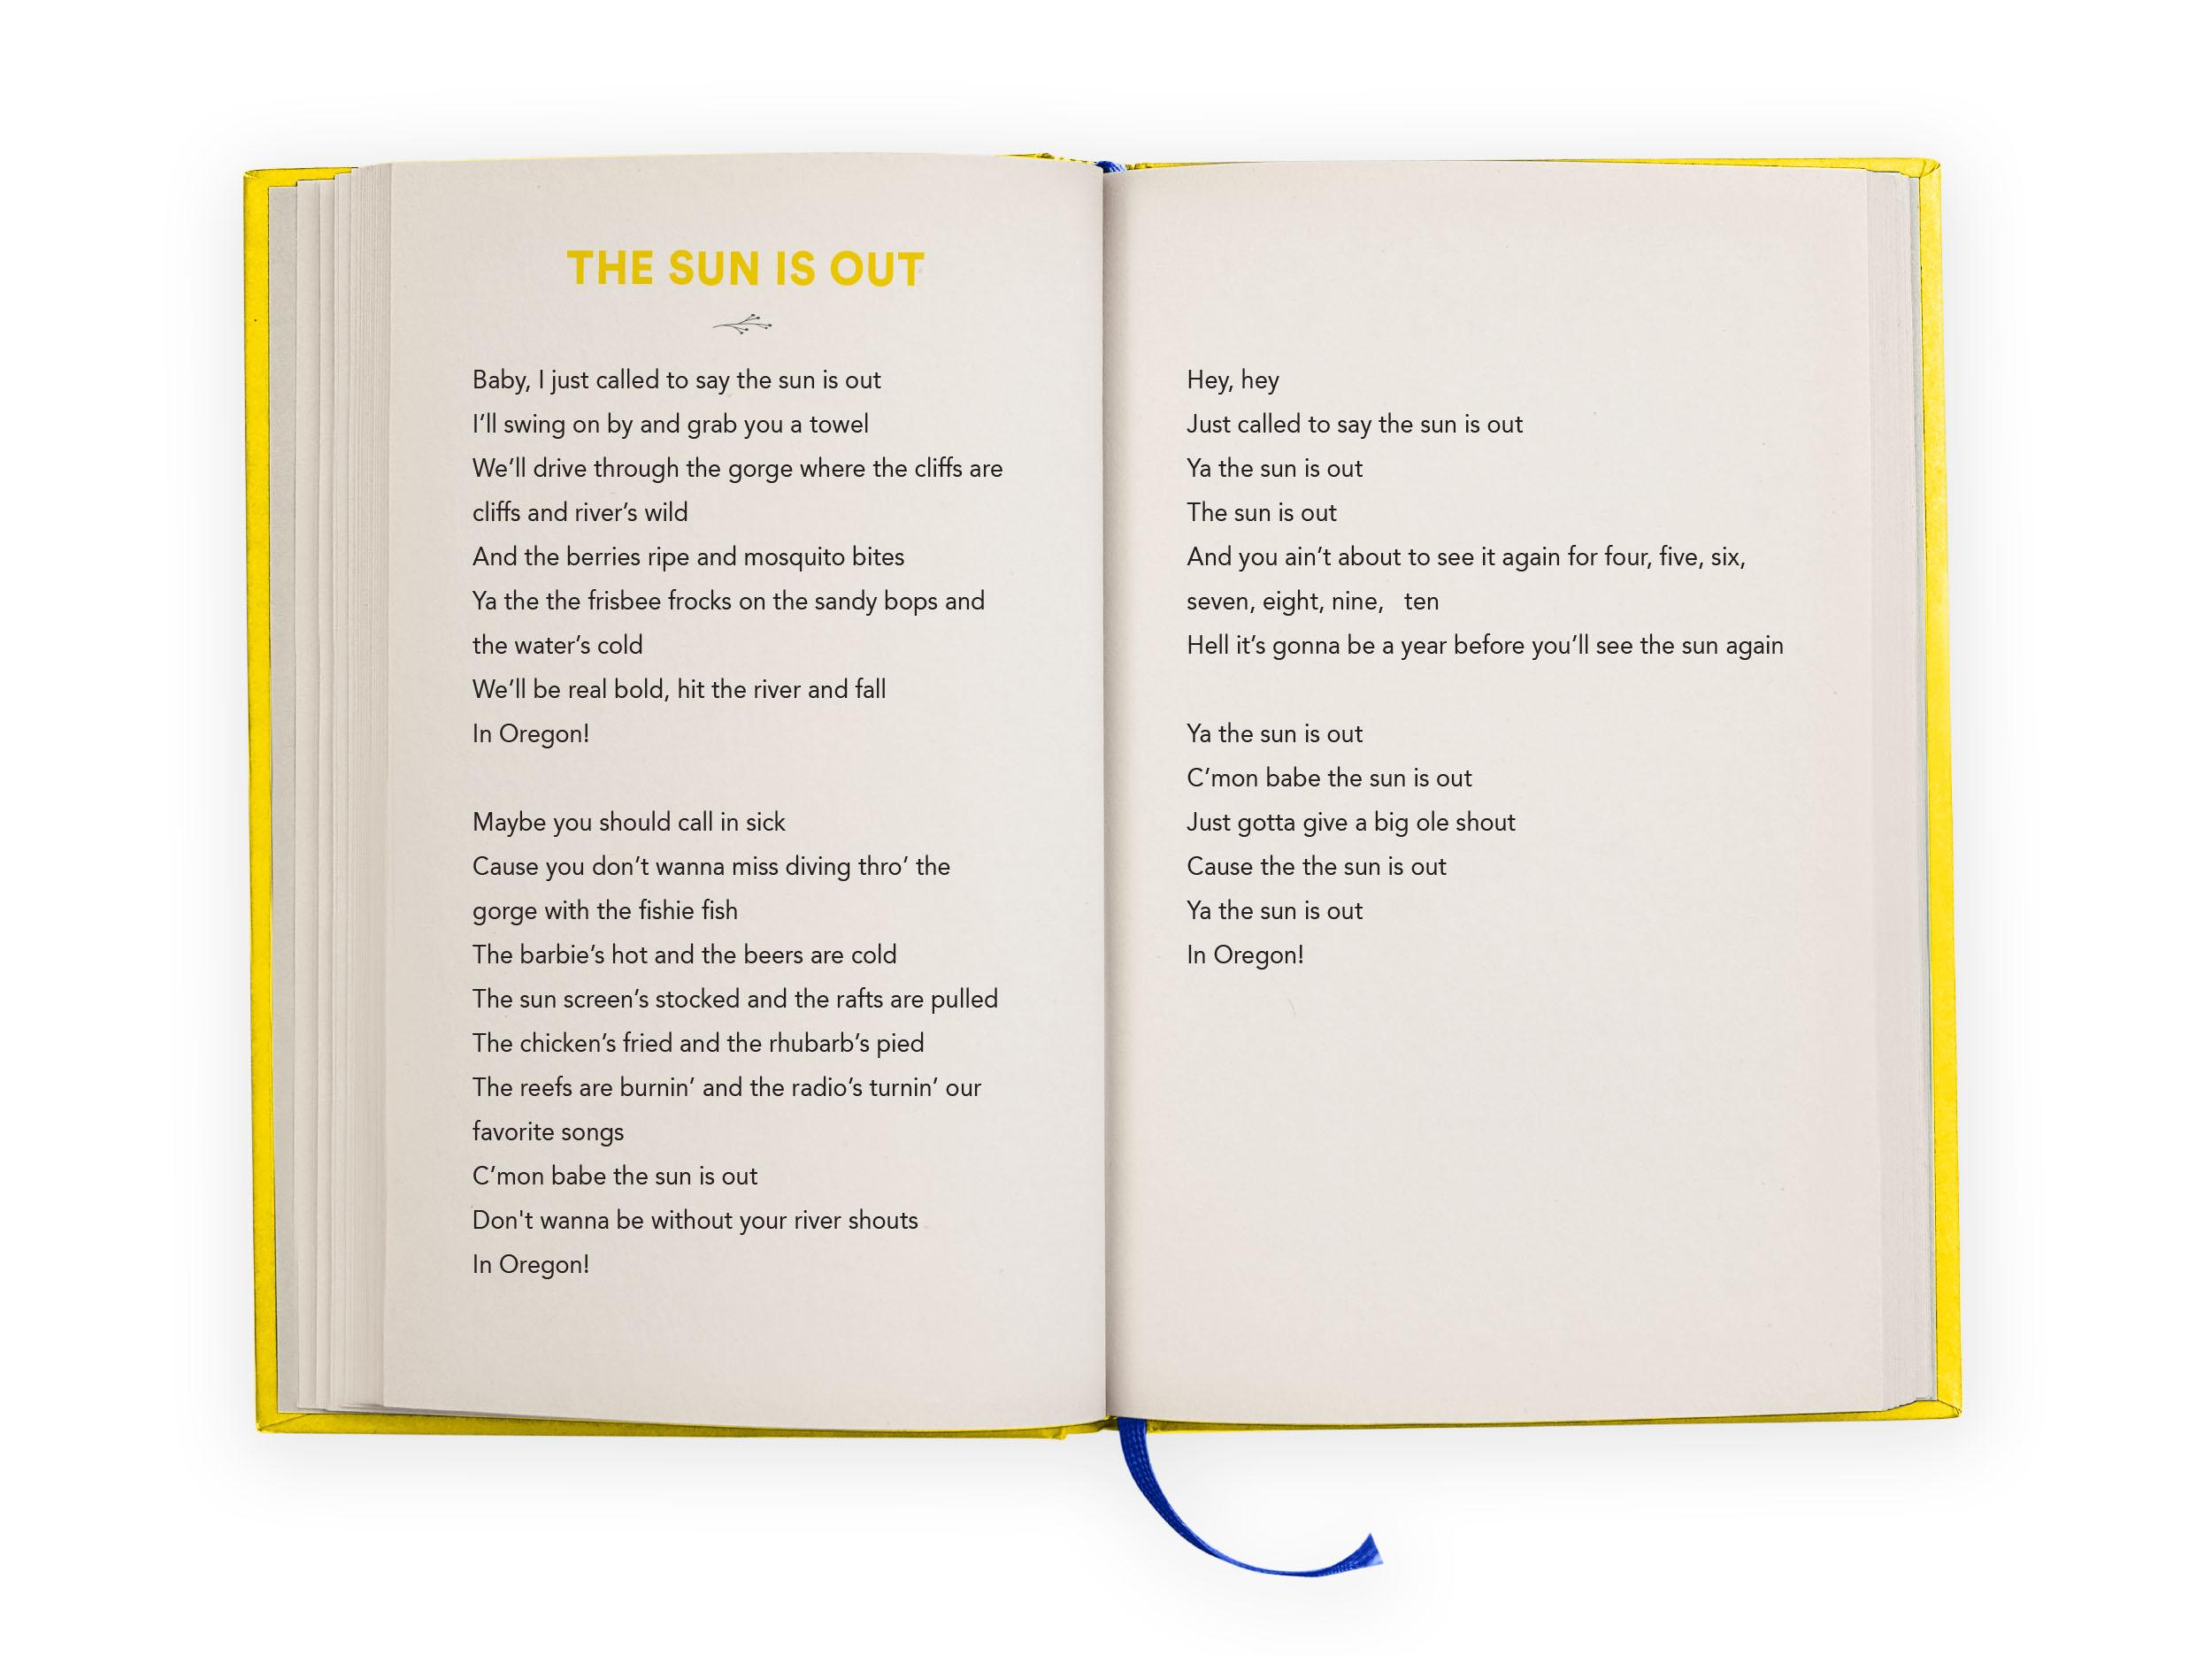 Book_1_TheSunIsOut.jpg